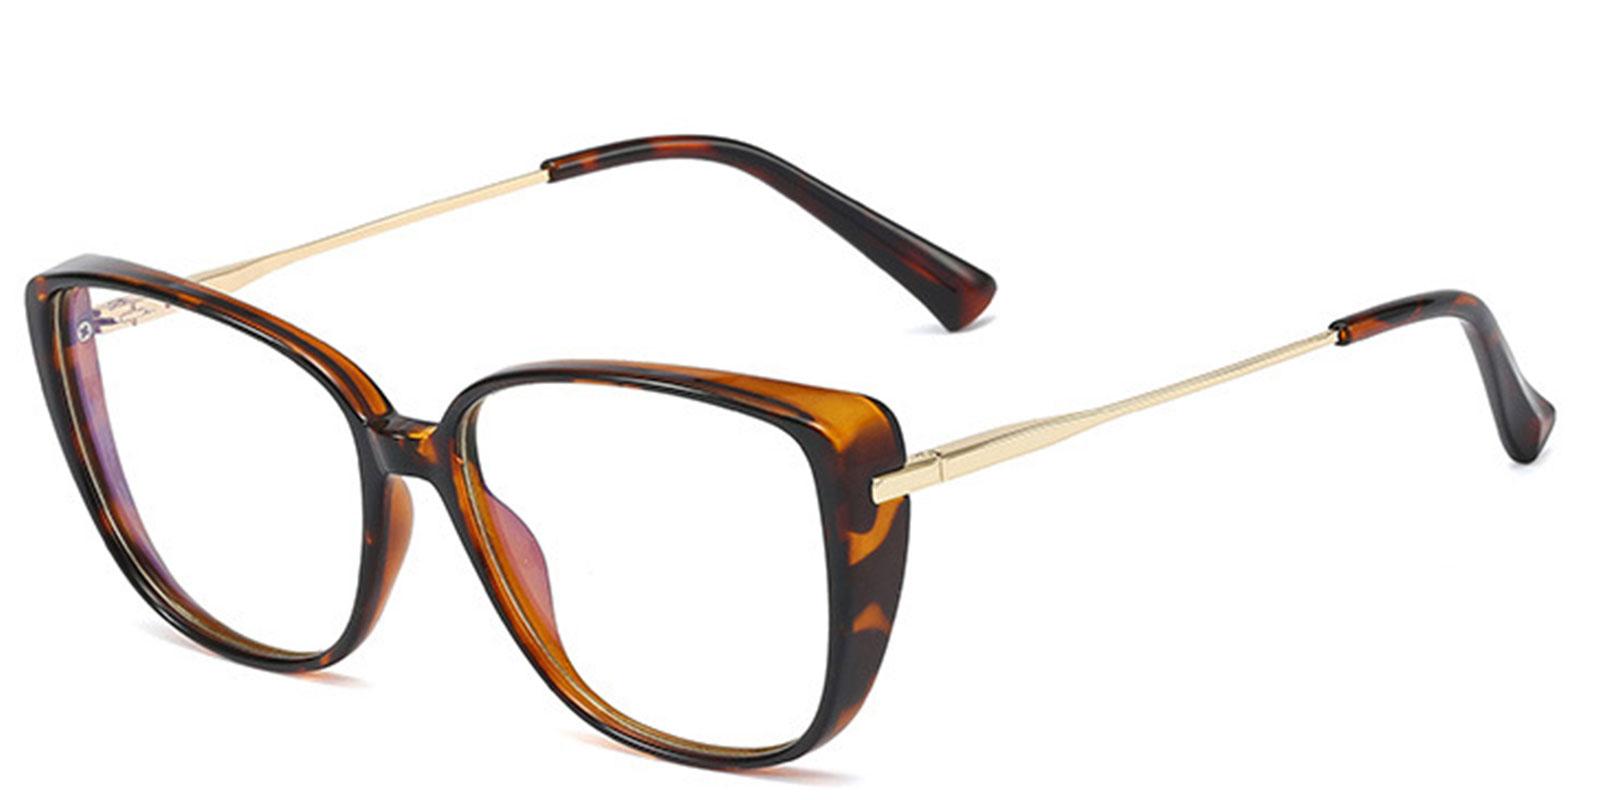 Dael-Trendy Transparent Tr90 Glasses with Anti Blue Light Lenses